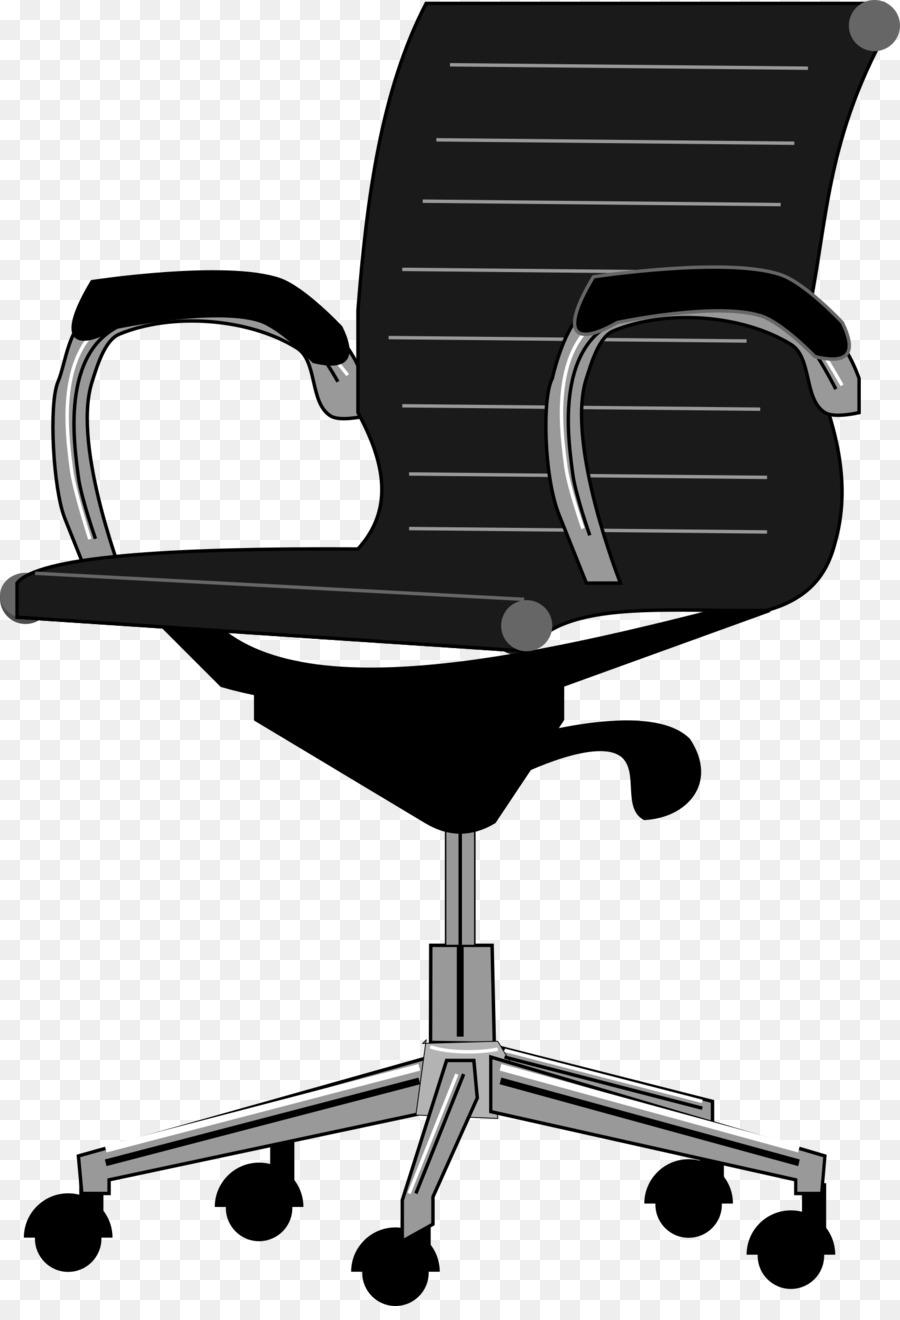 Desk clipart desk chair. Table cartoon office transparent